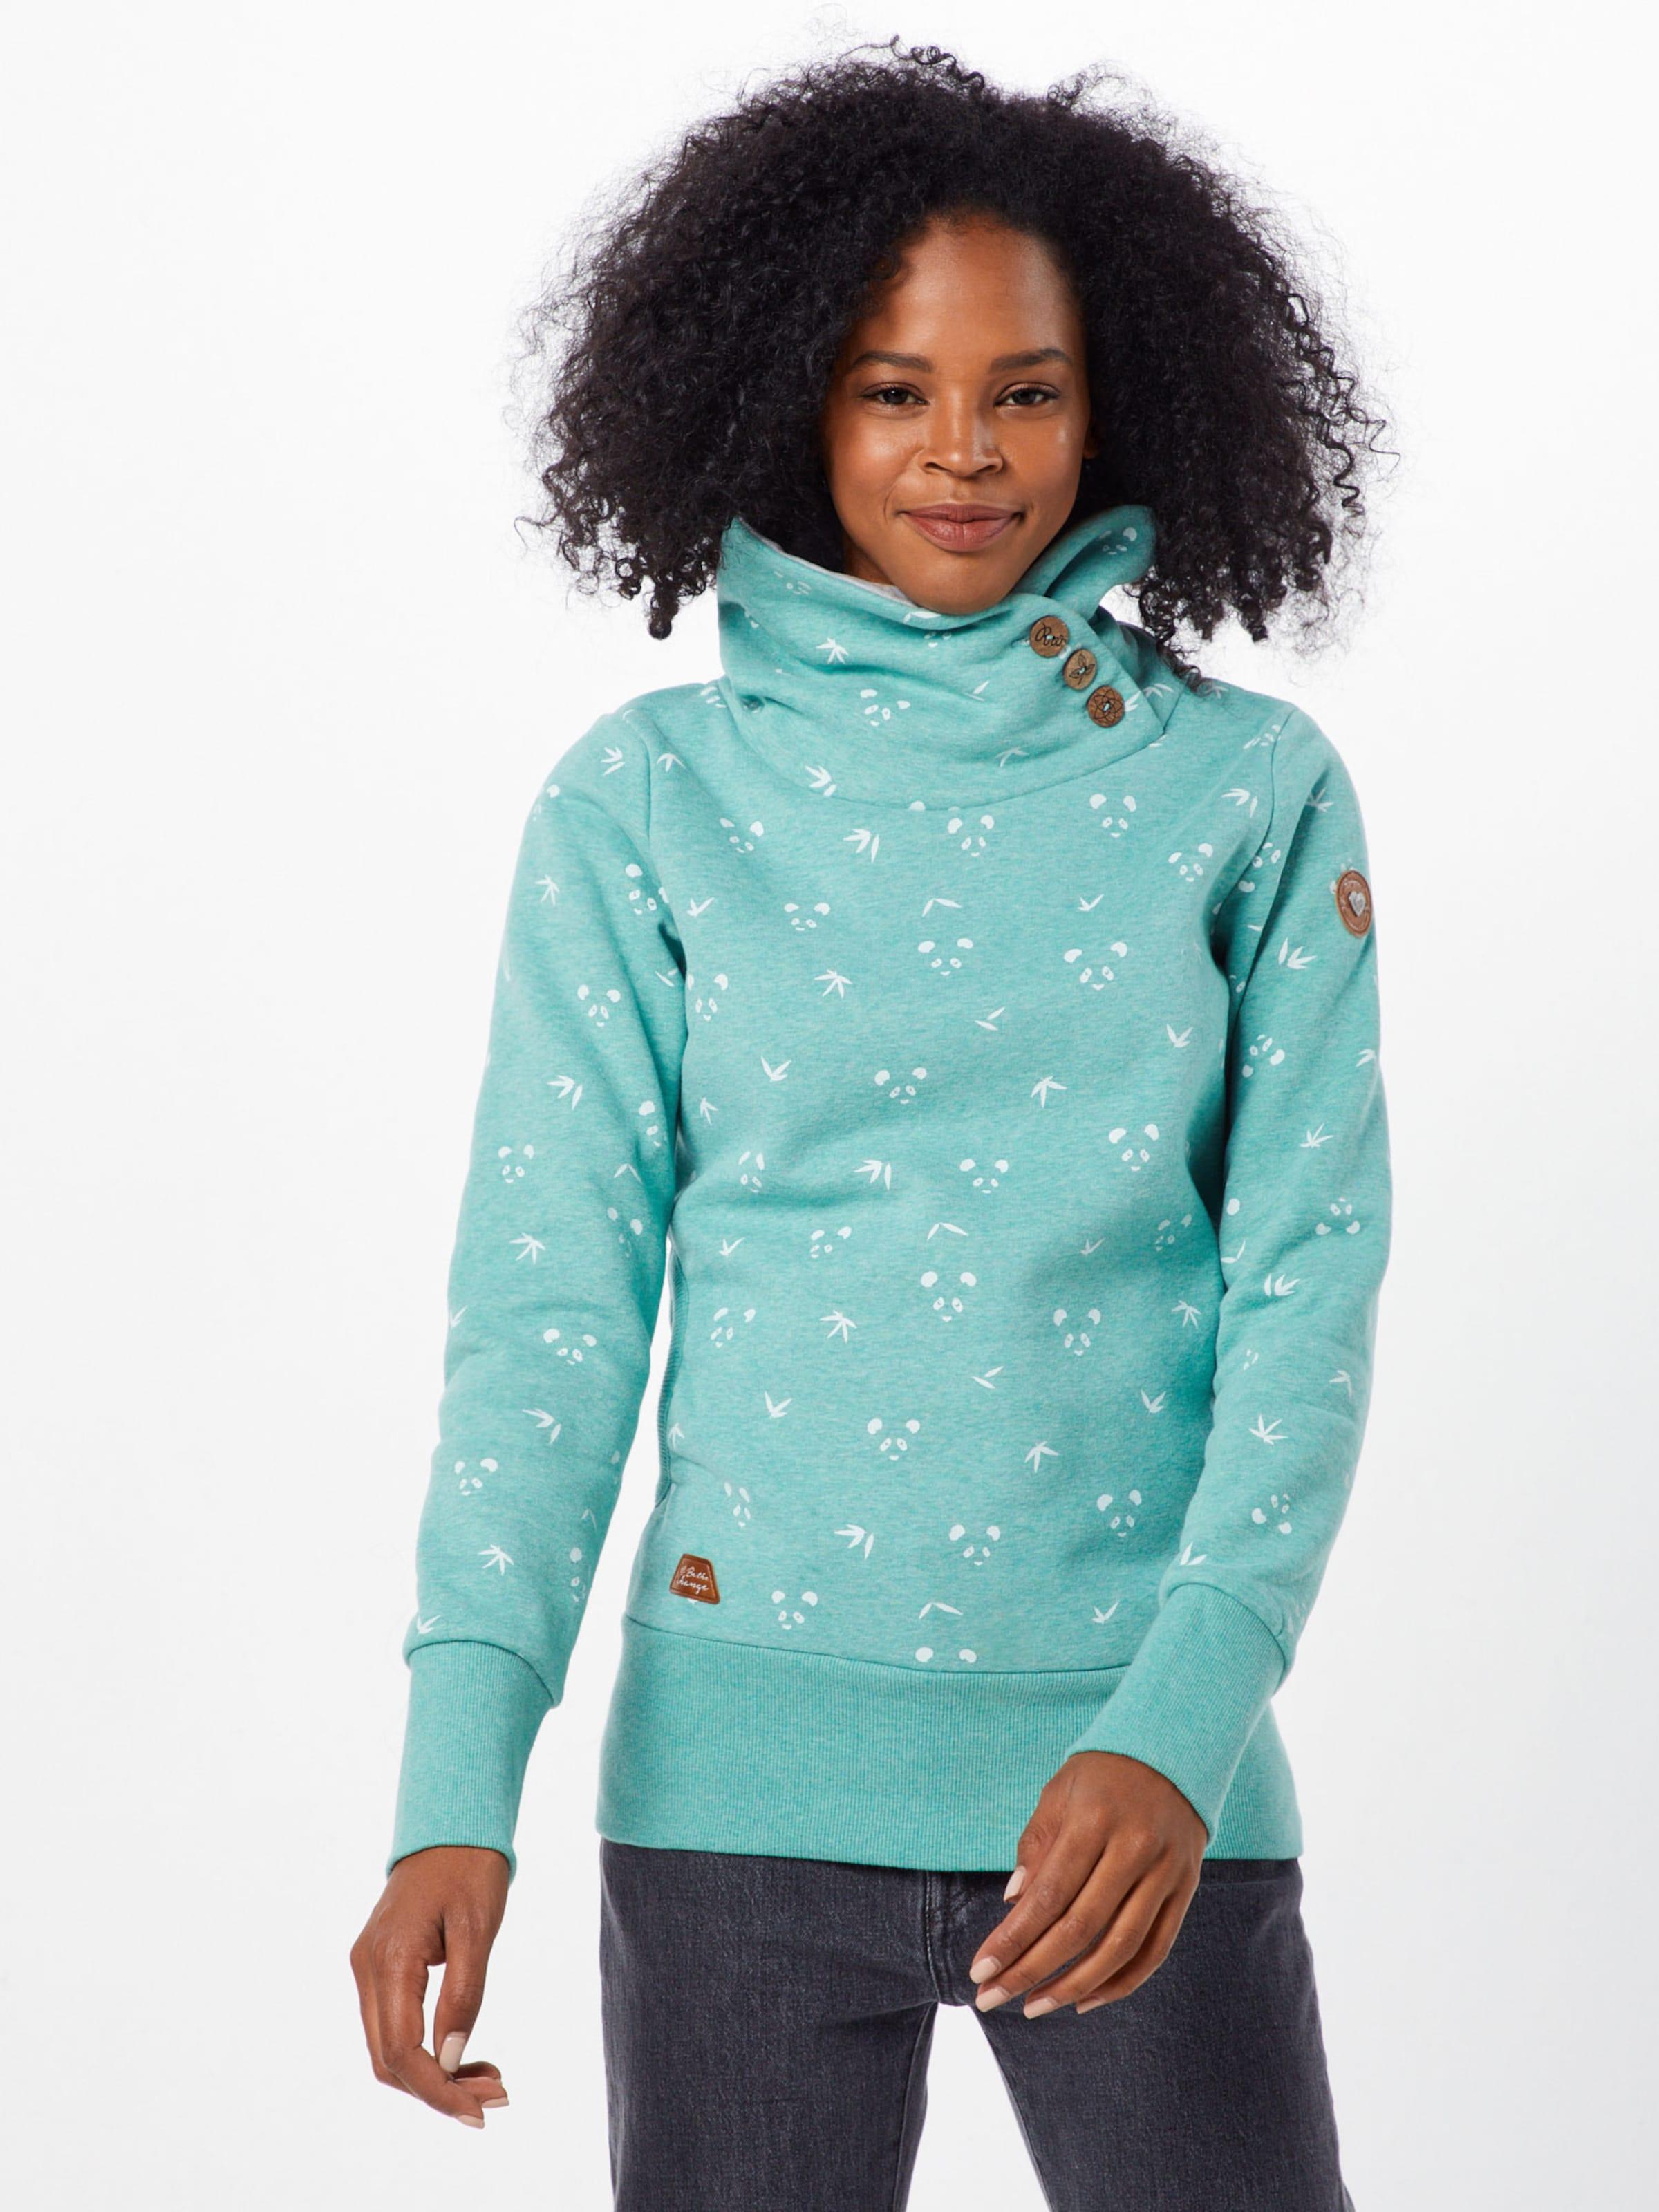 Grün Ragwear Grün Sweatshirt Sweatshirt Sweatshirt In In Ragwear Ragwear In eW9YEDH2Ib